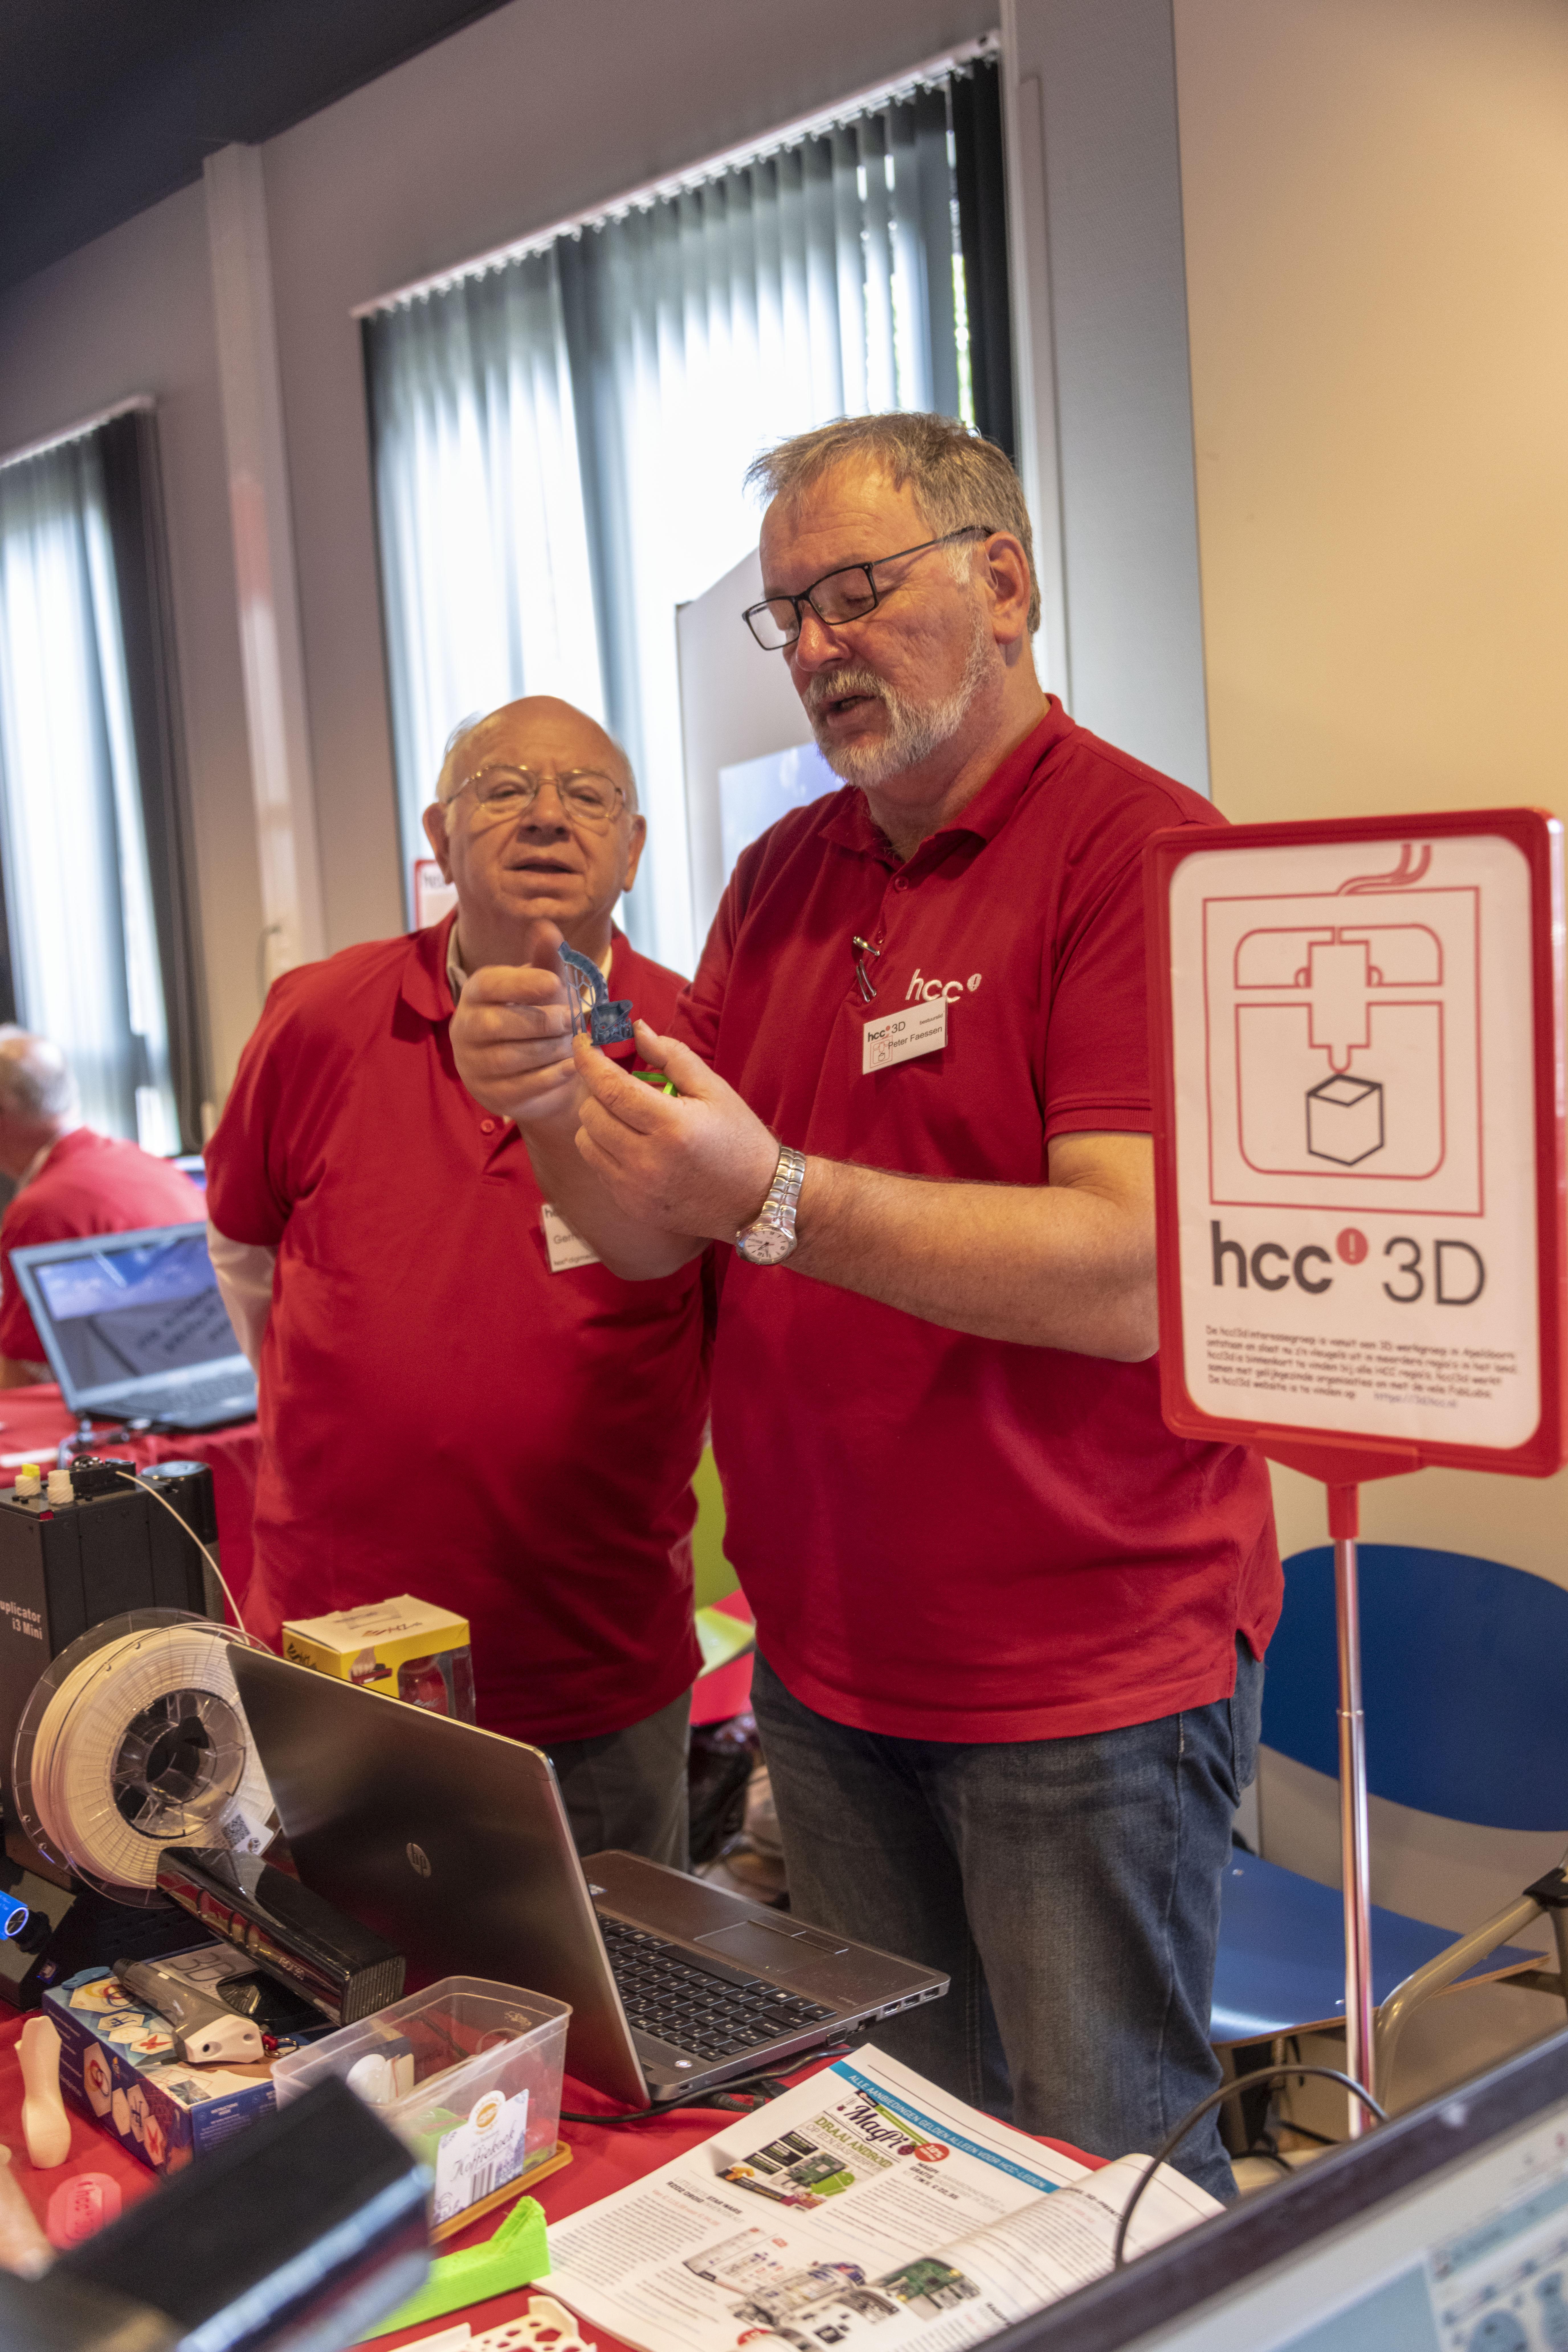 2018-10-20-FB - 08 - HCC!Digimedia - HCC!fotovideo event - dok Zuid - Apeldoorn